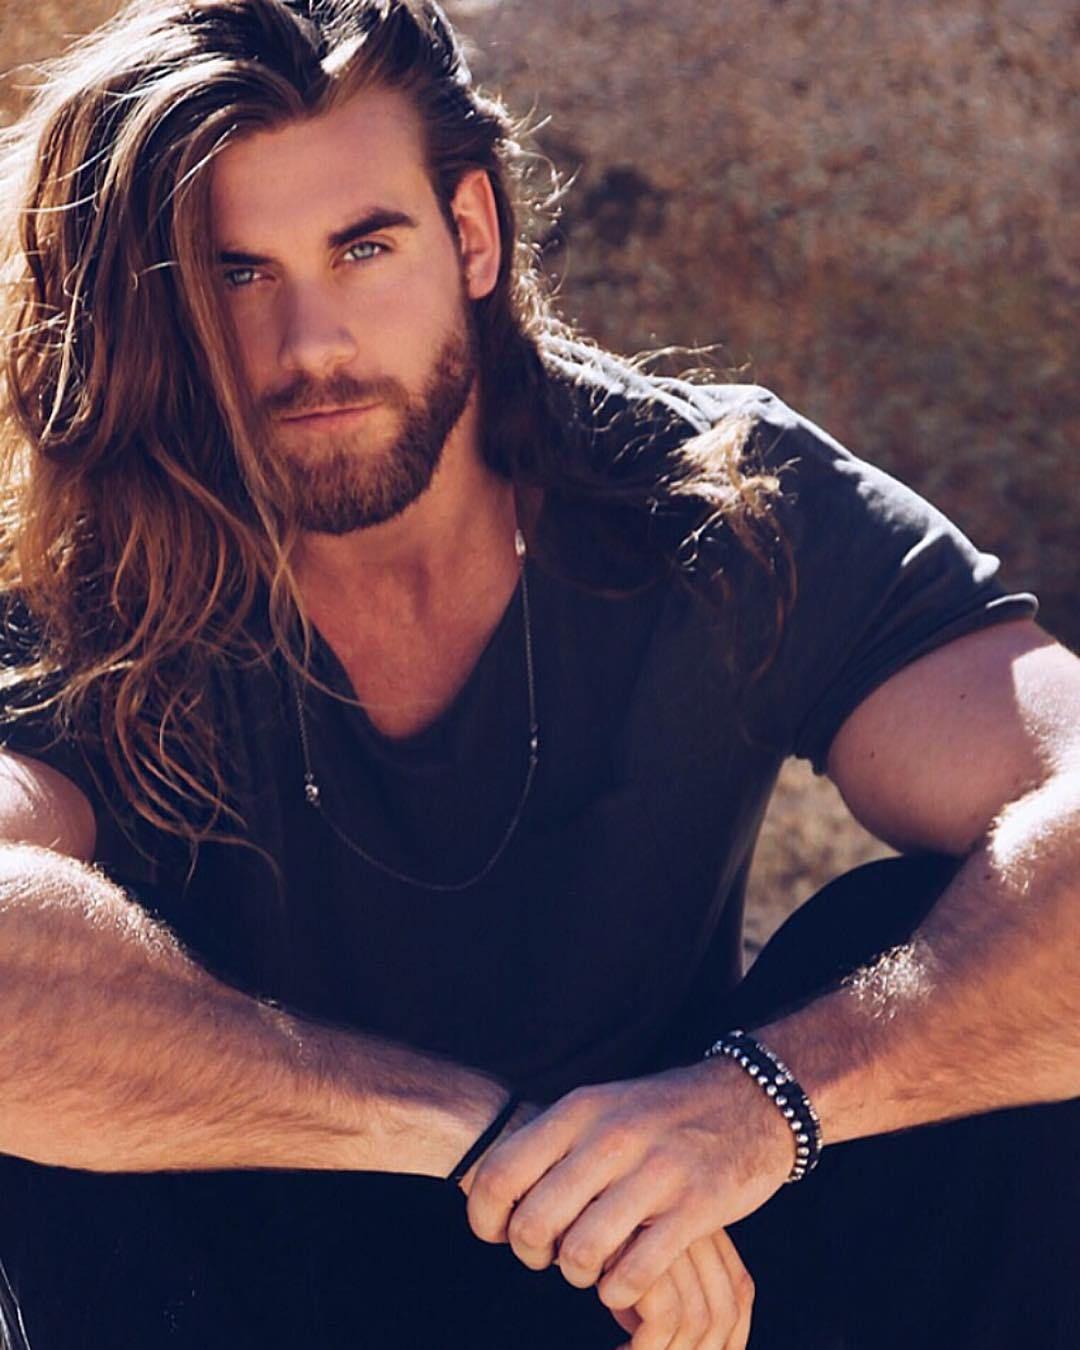 Get The Classic Long Stubble Beard Style In 3 Steps Long Hair Styles Men Gorgeous Men Stubble Beard